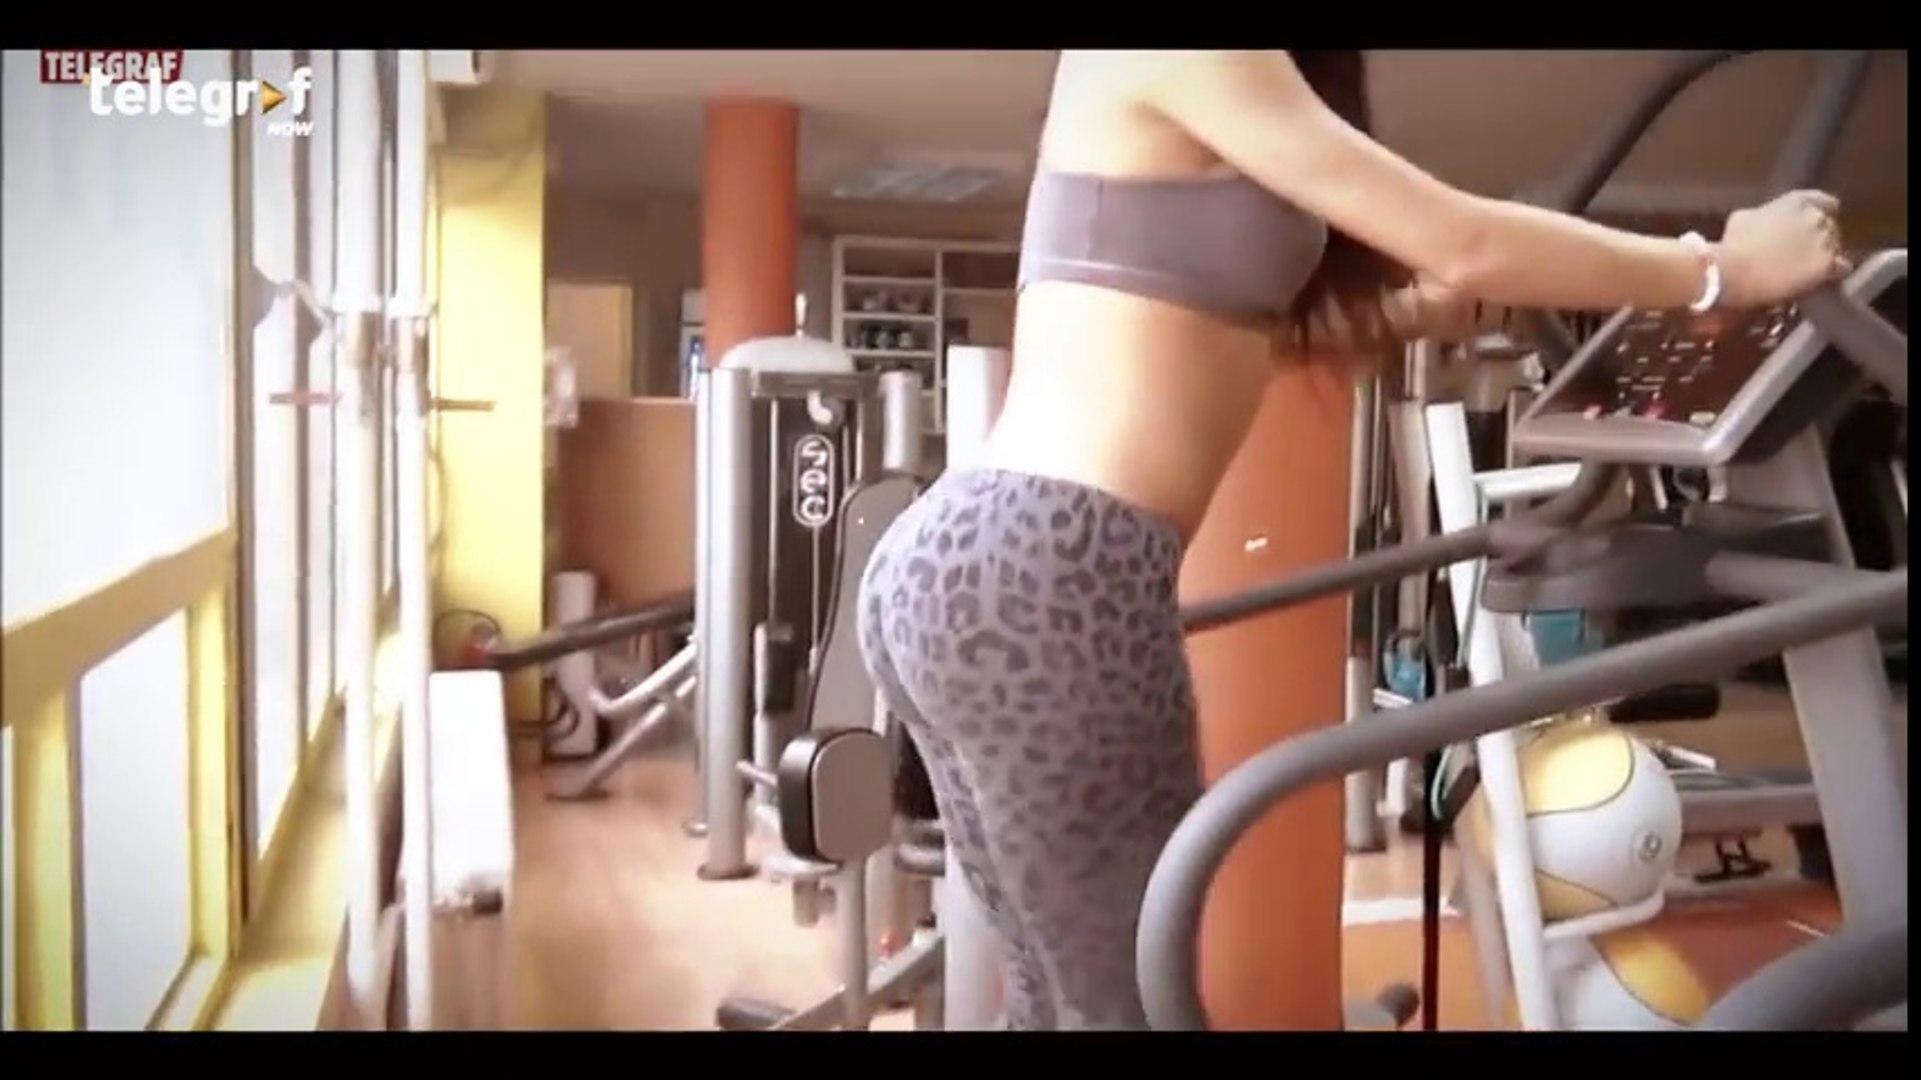 TOP 5 SEXY CICA U TERETANI - Hot sexy chicks at the gym